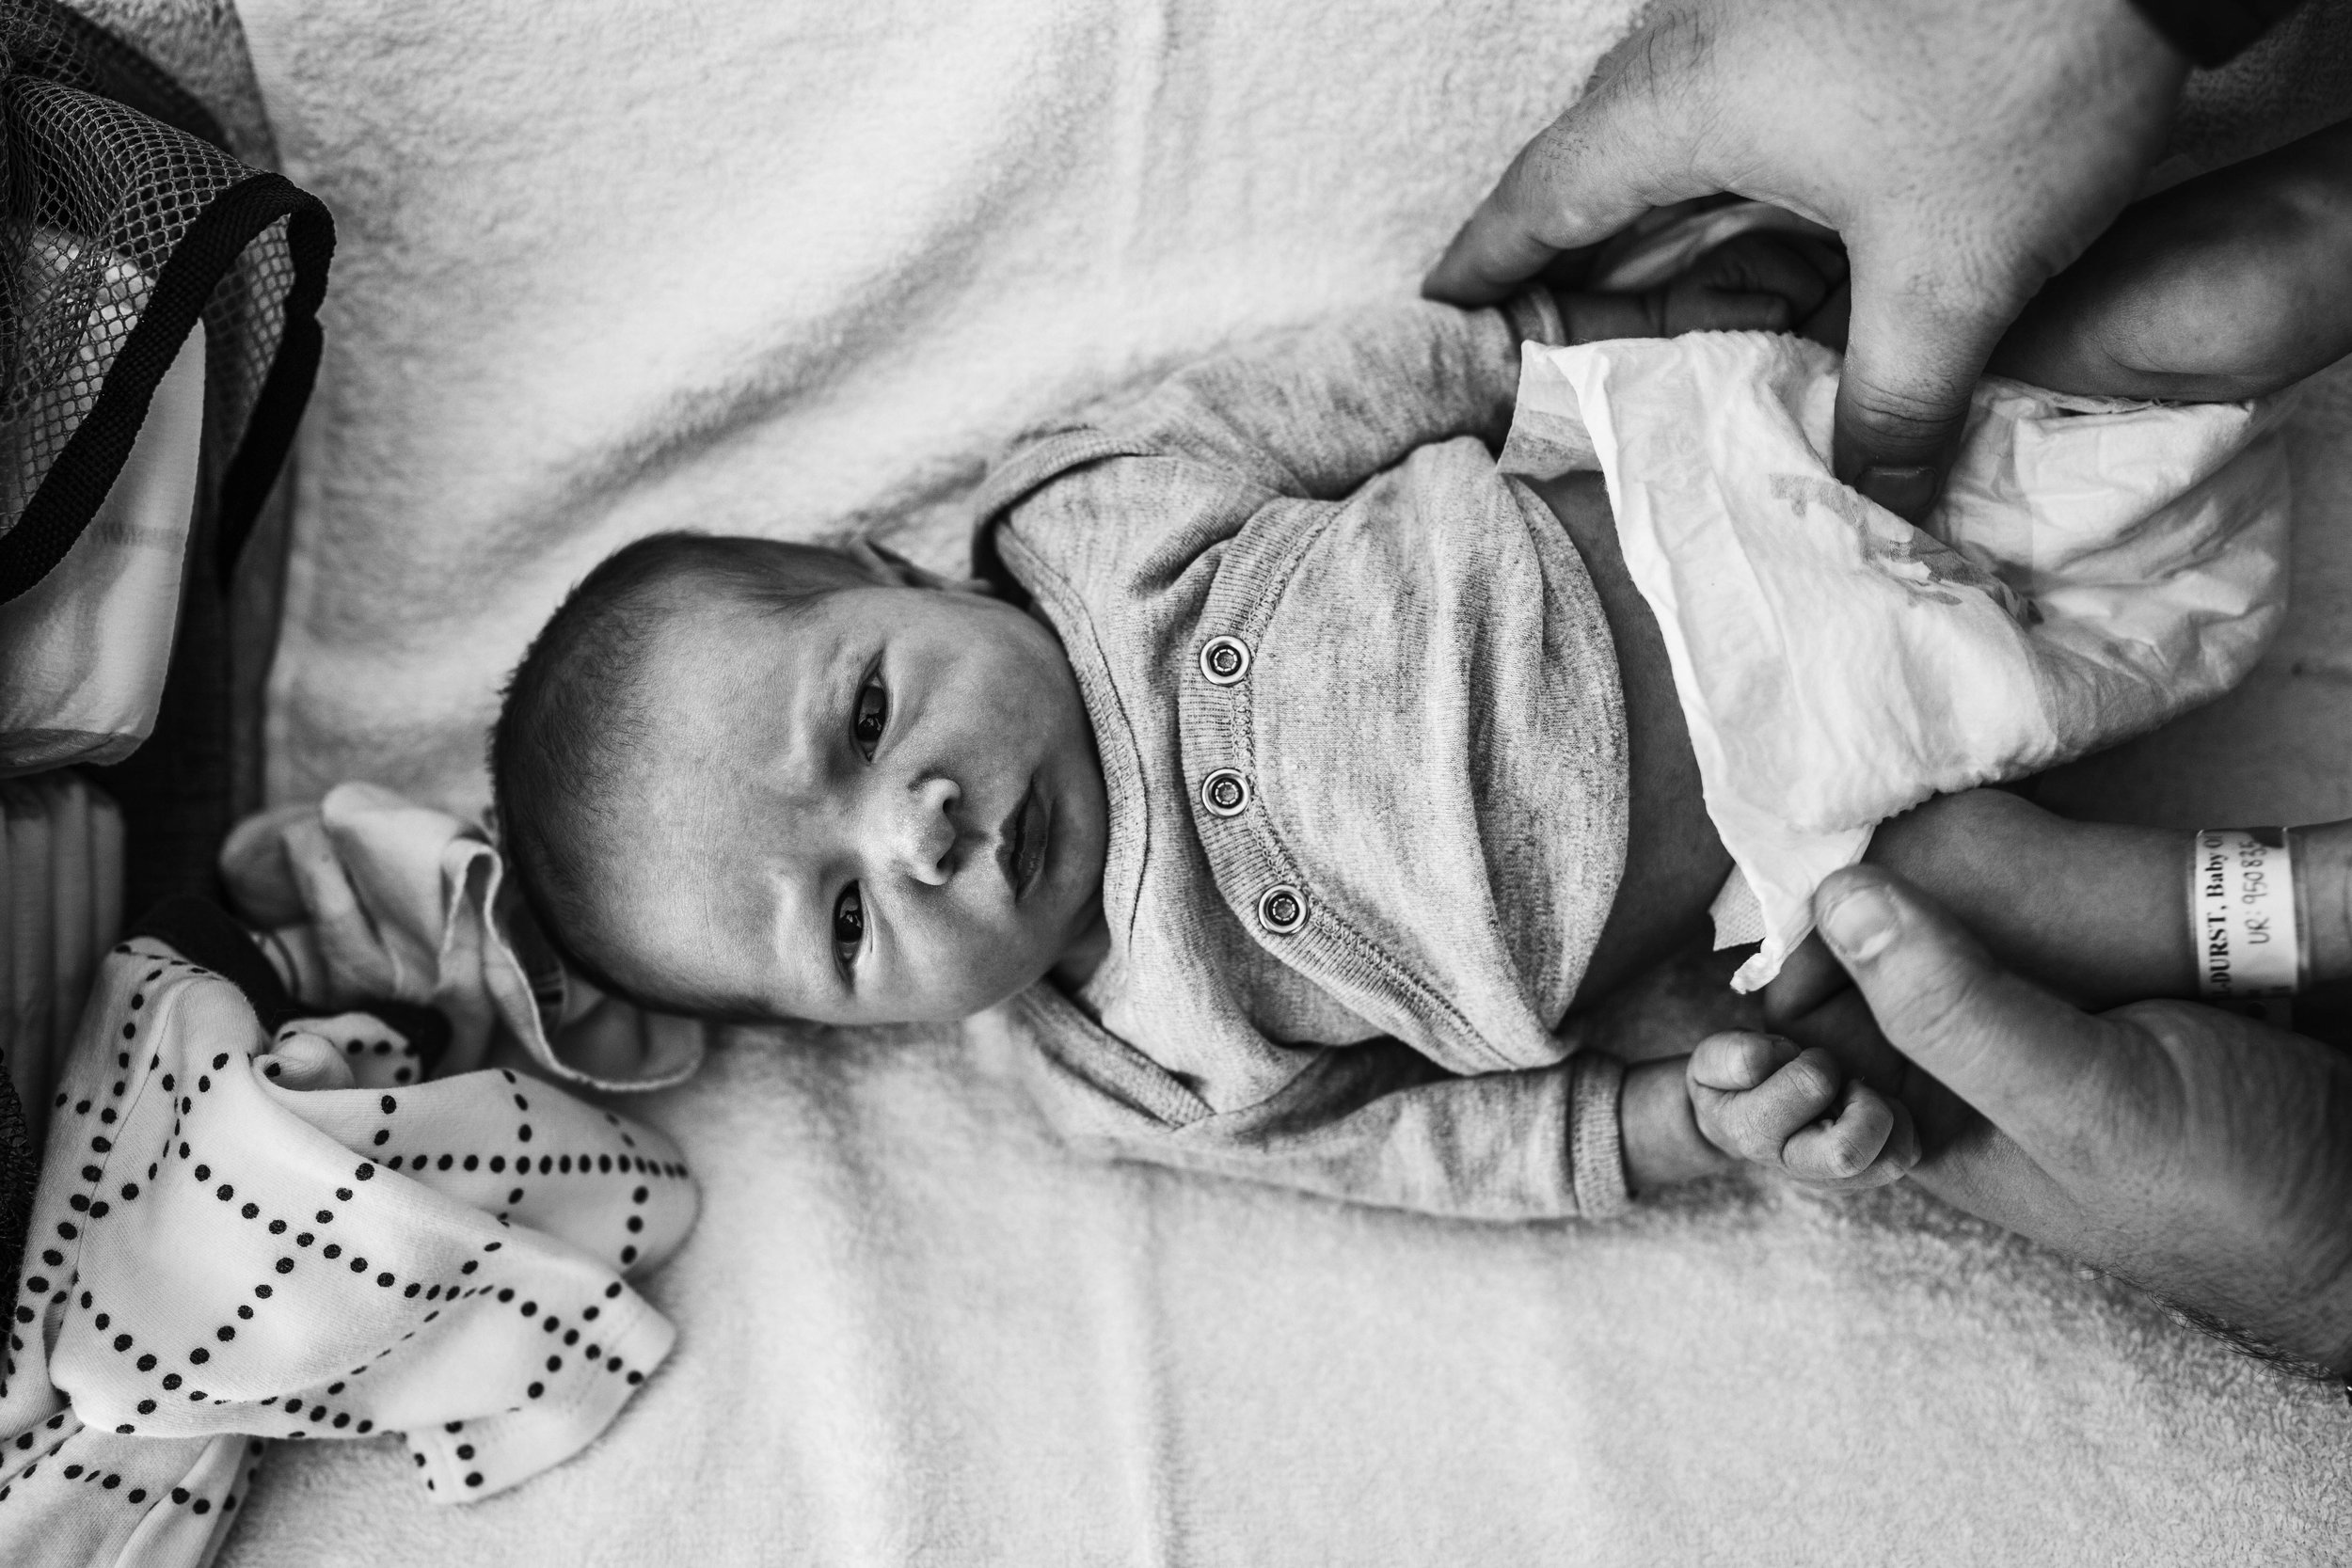 baby-boy-nappy-change-looking-at-camera.jpg